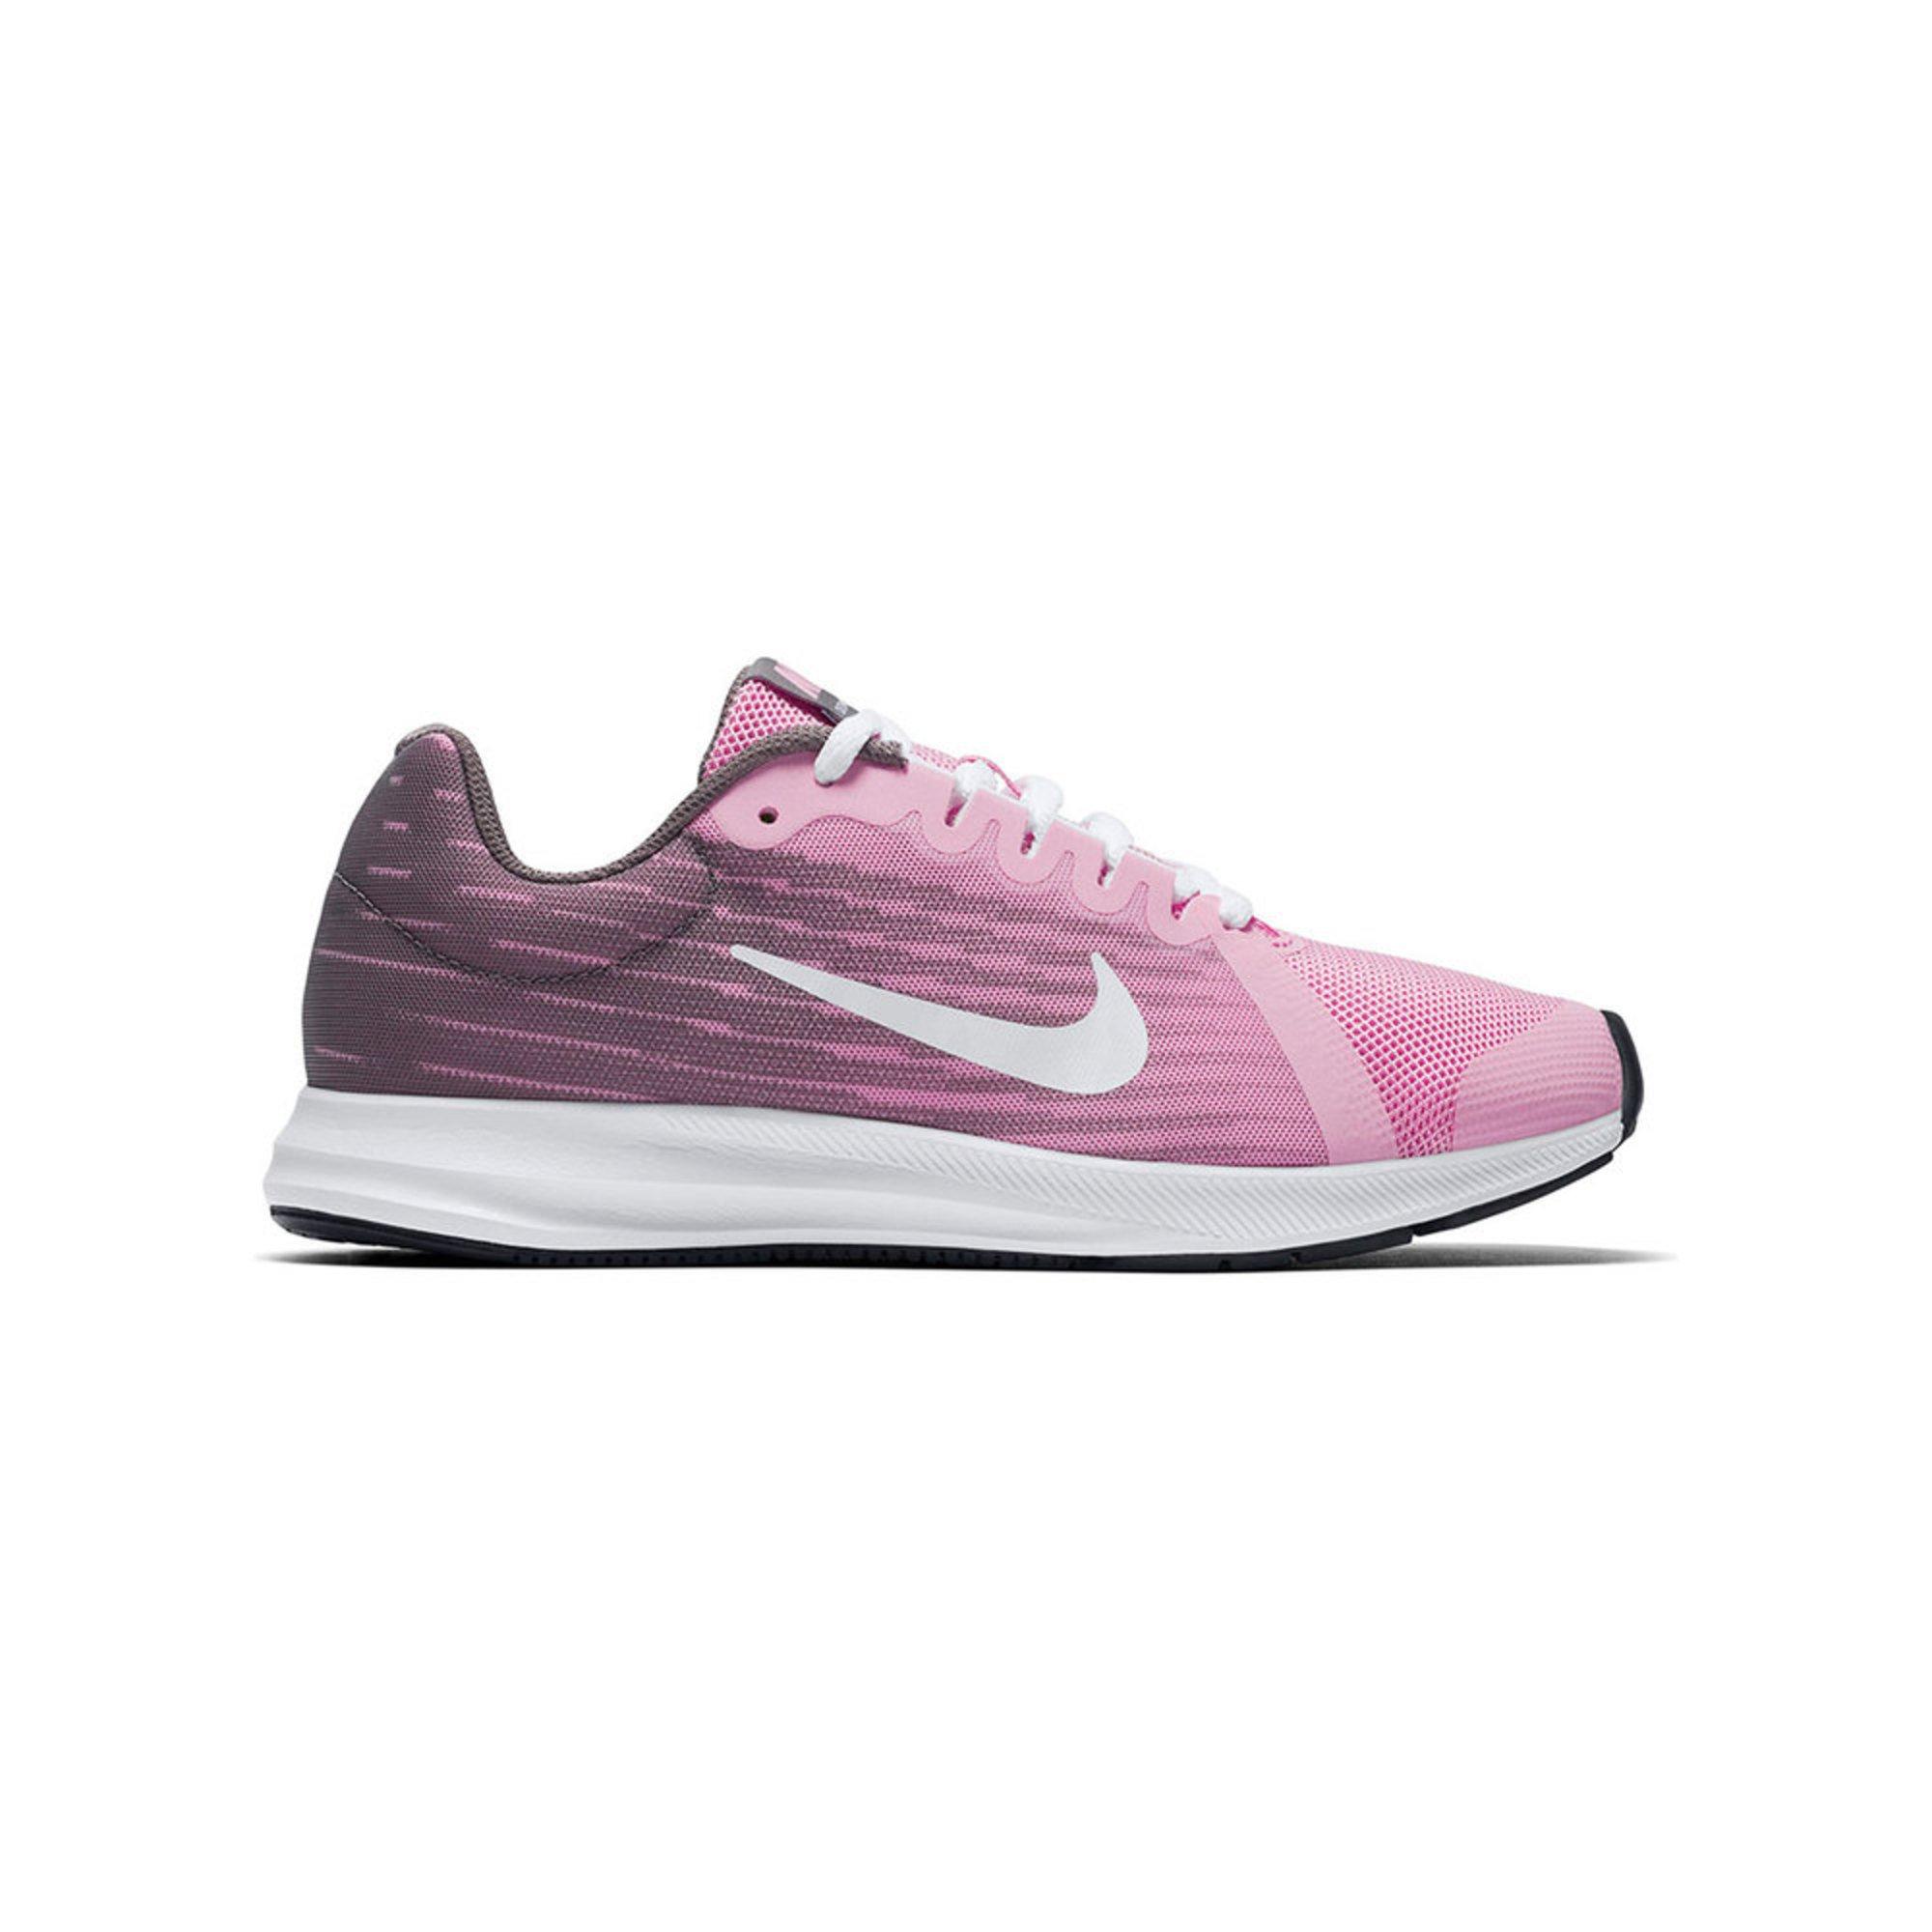 a07156e5d Nike Girls Downshifter 8 Running Shoe (youth) | Youth Shoes | Shoes ...